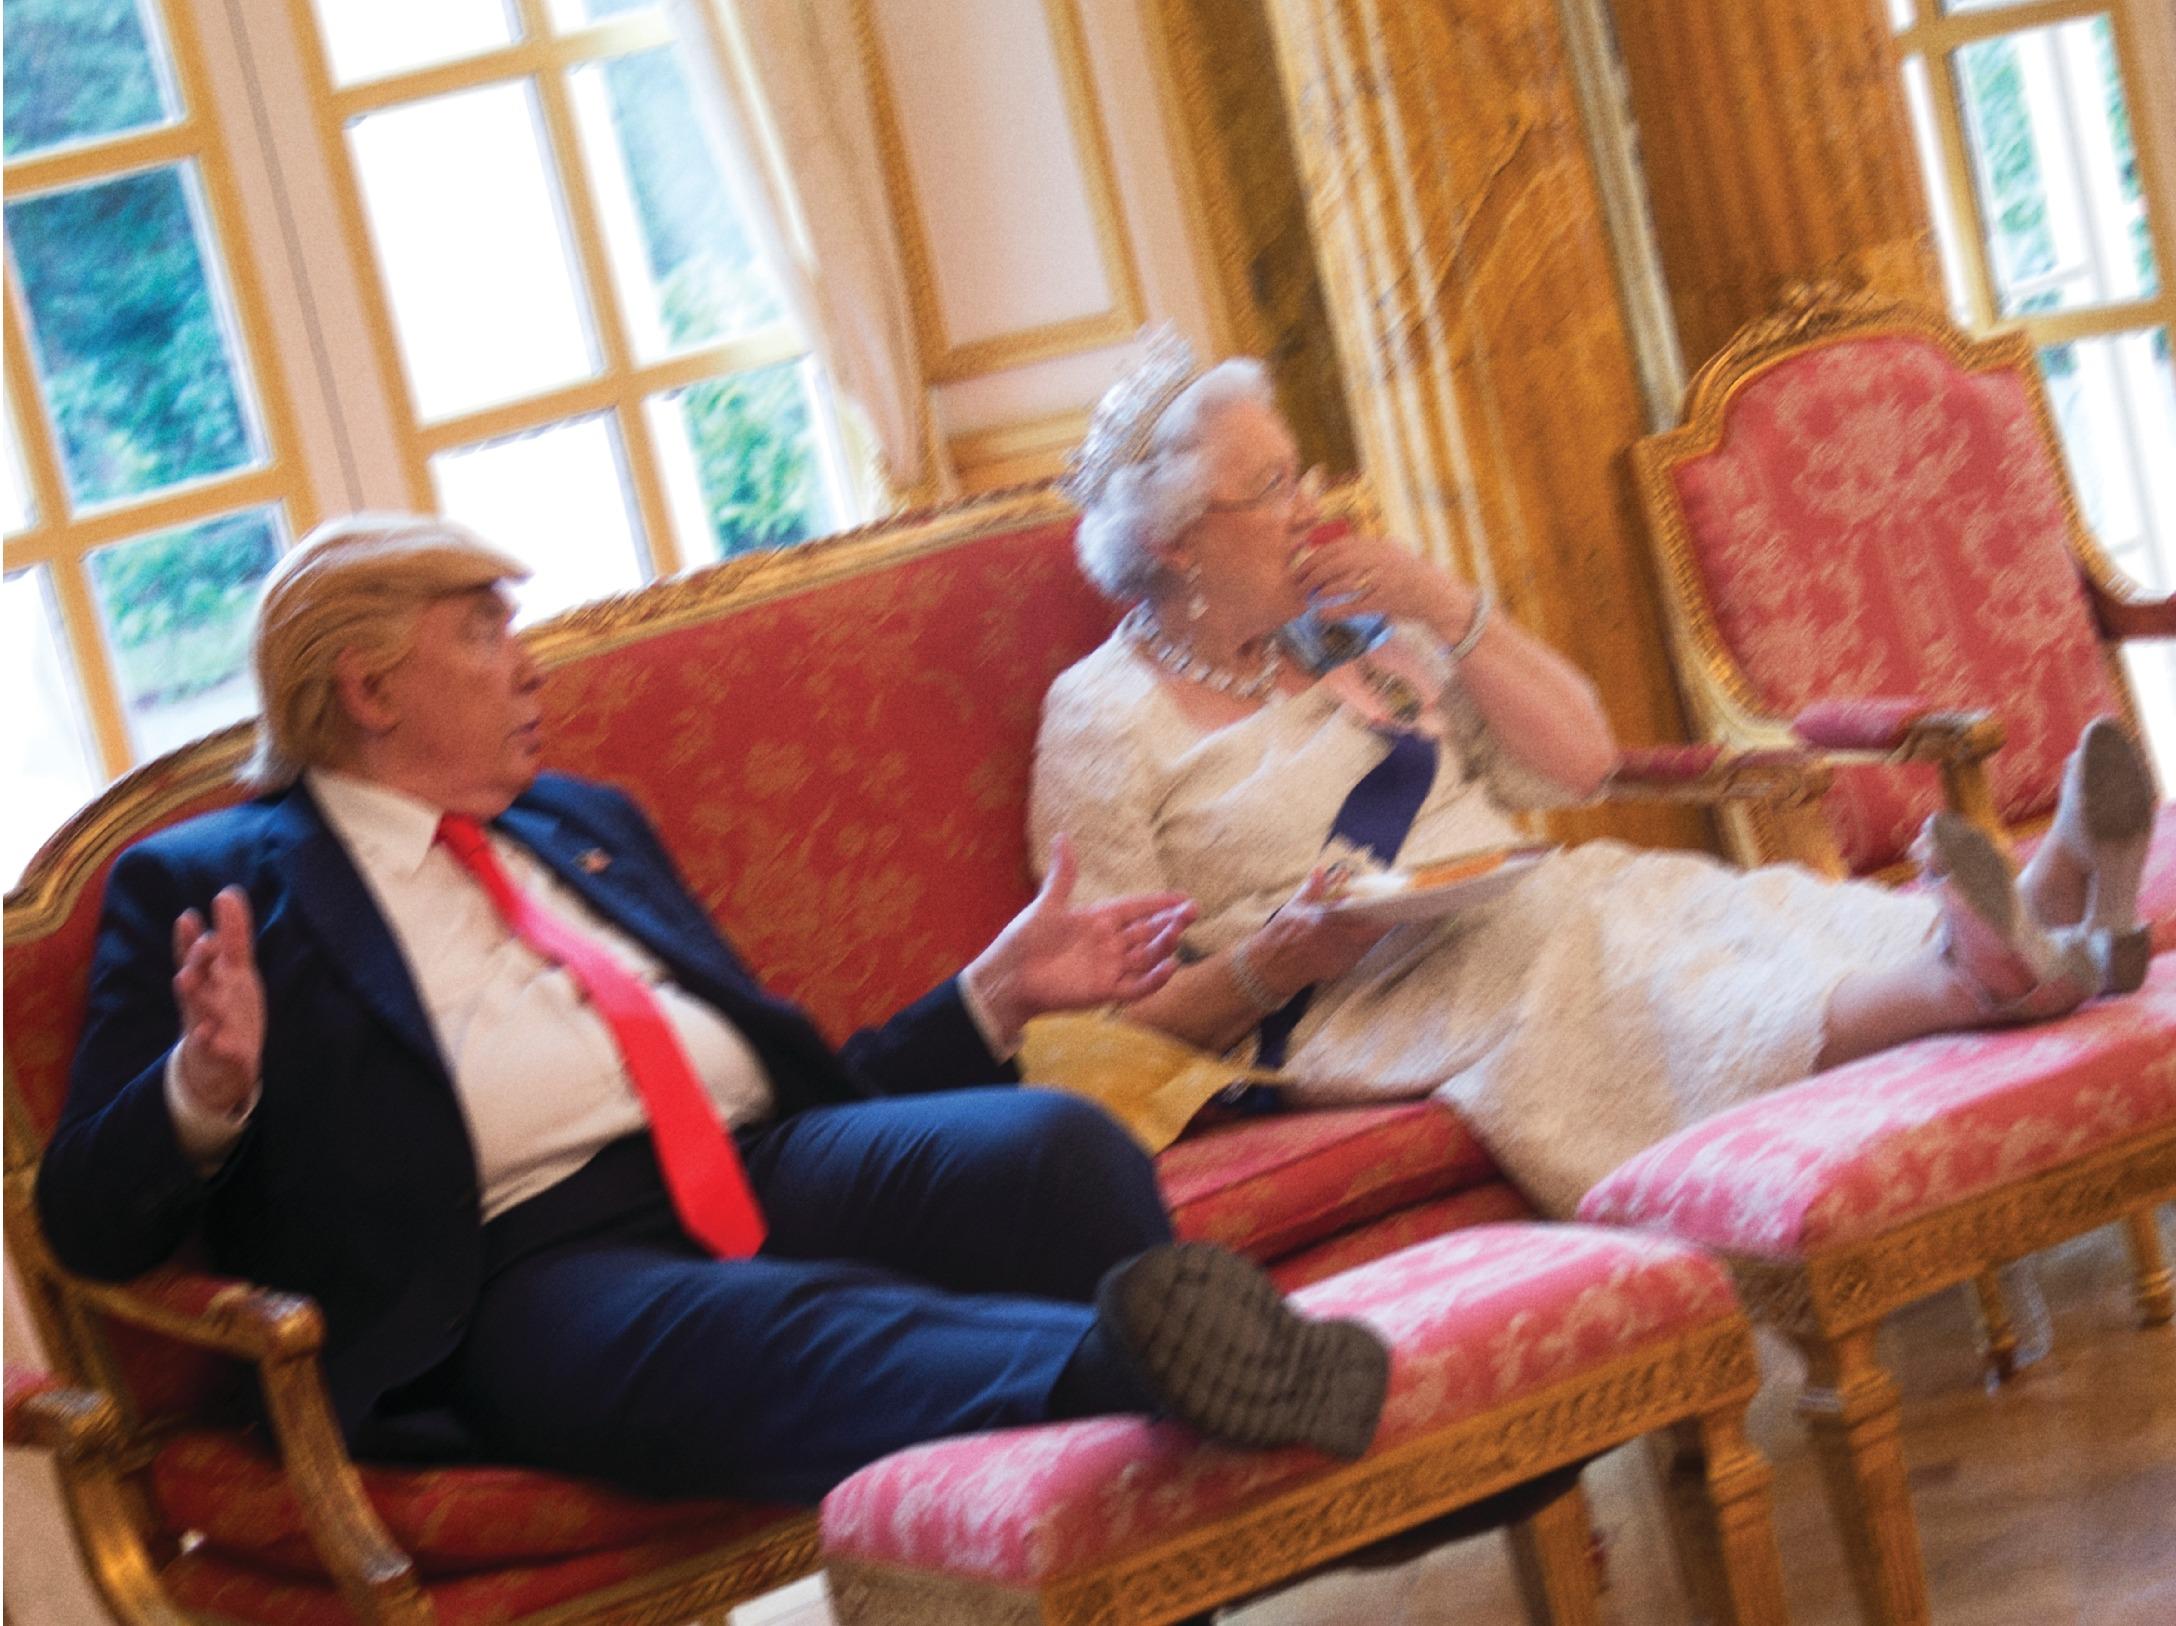 Trump & Queen Have Cucumber Sandwich